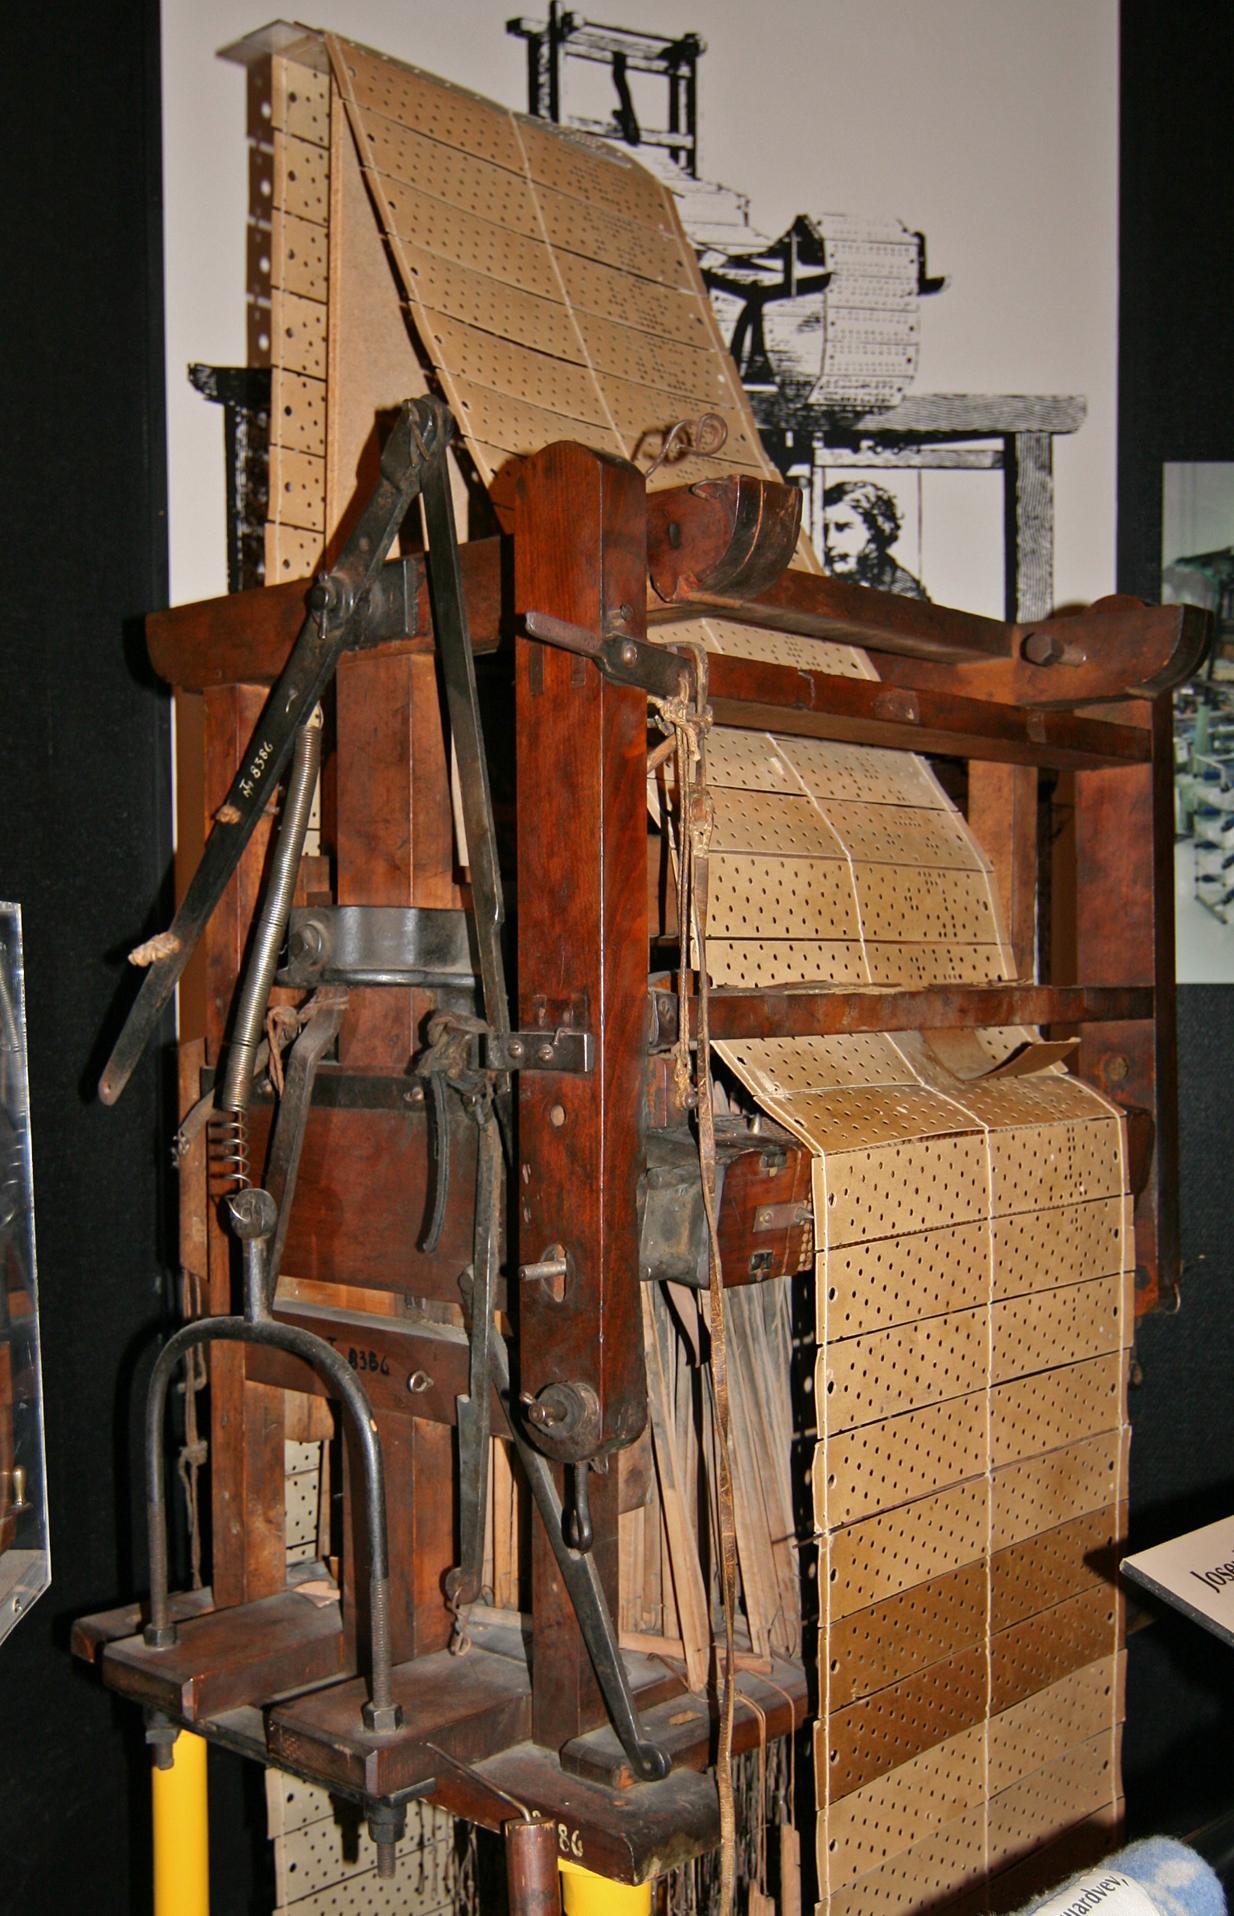 File:Jacquard loom.jpg - Wikimedia Commons